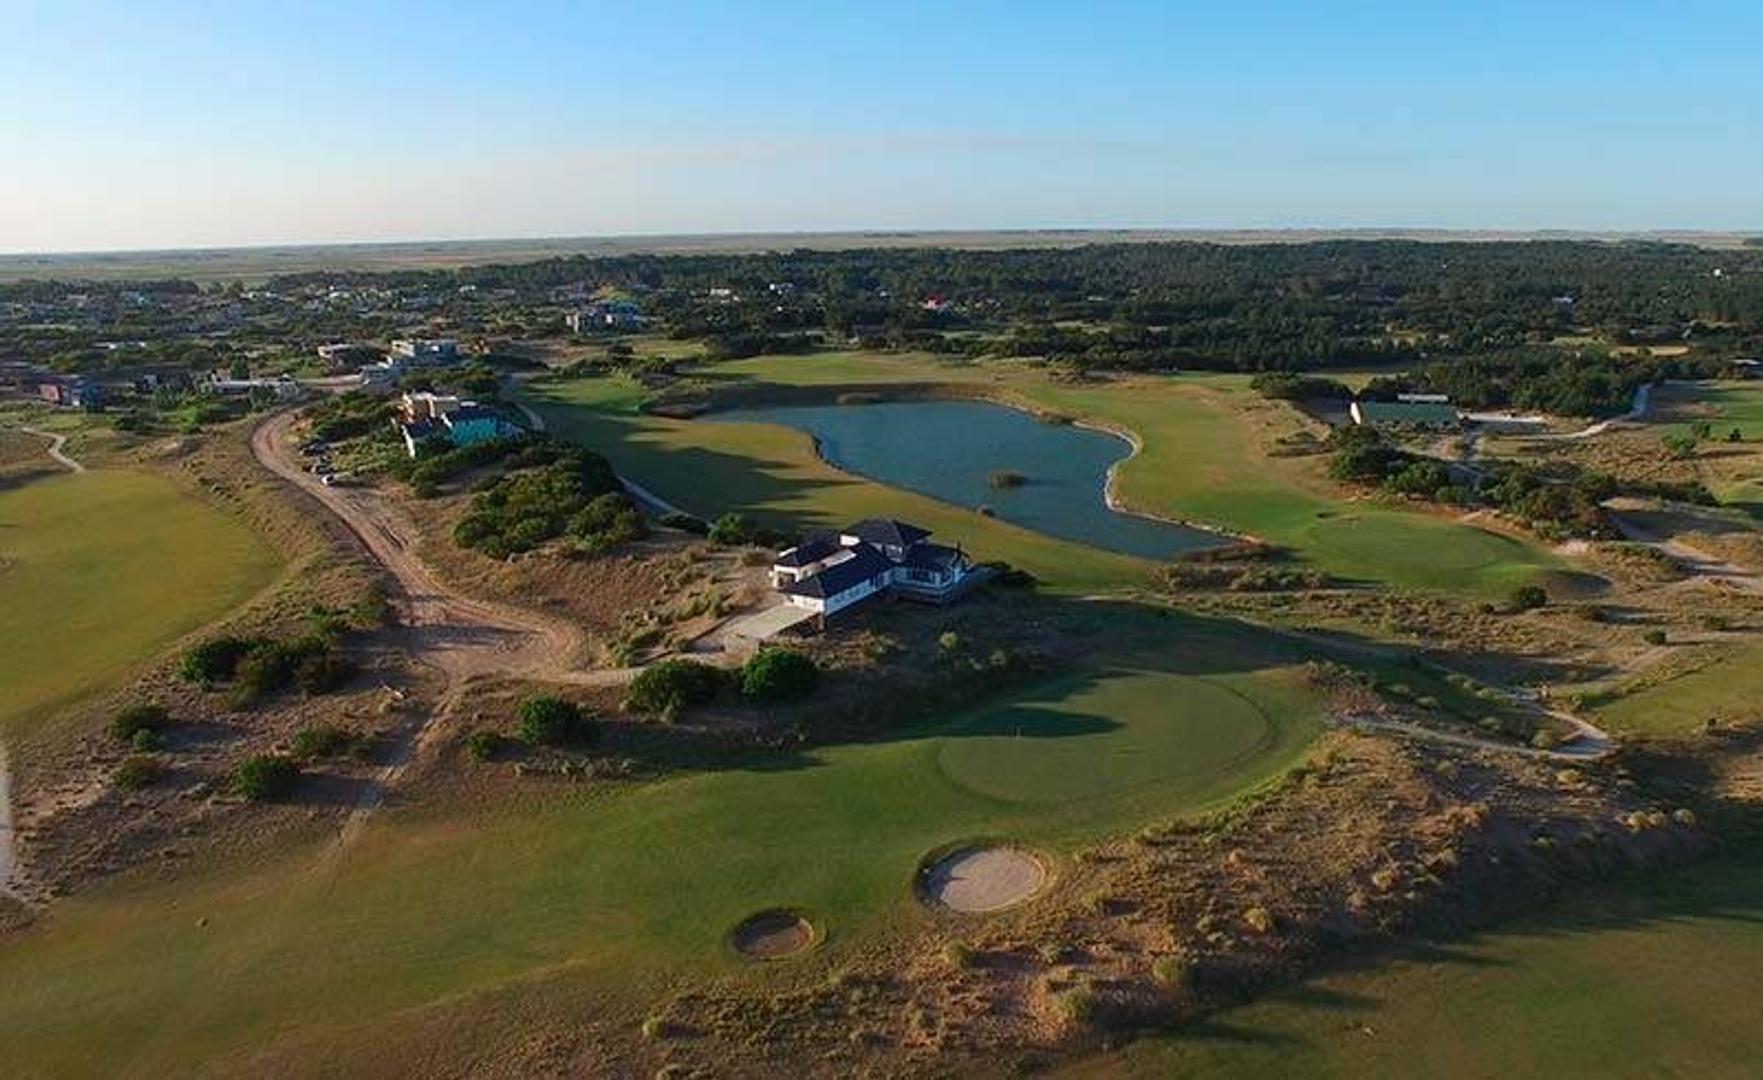 Costa Esmeralda - Lote 100  de 1646 m2 - Golf I